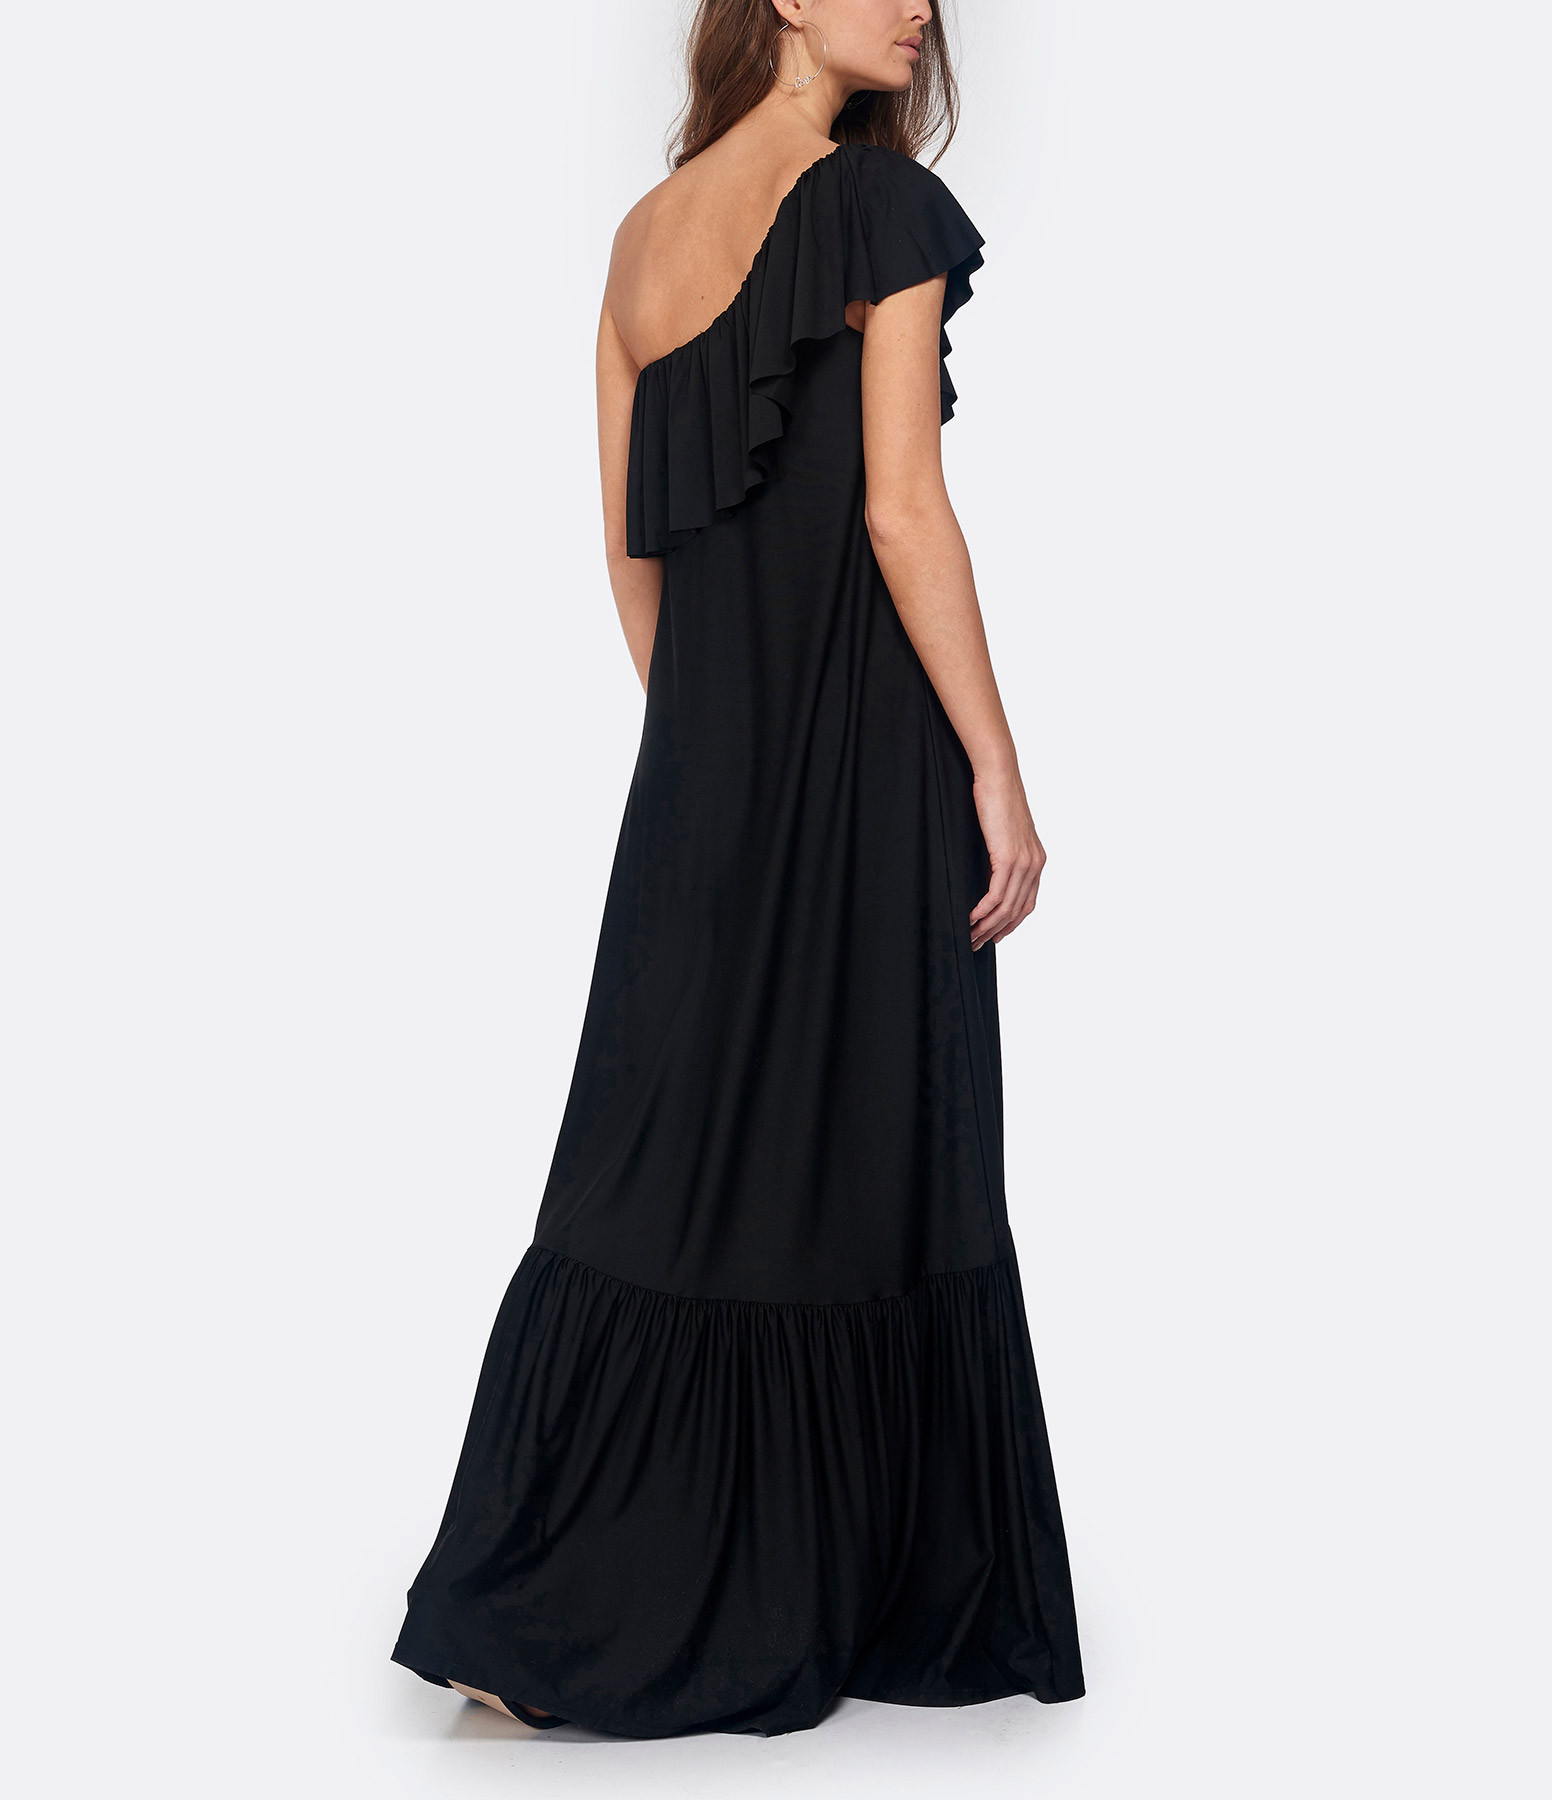 CALARENA - Robe Star Noir